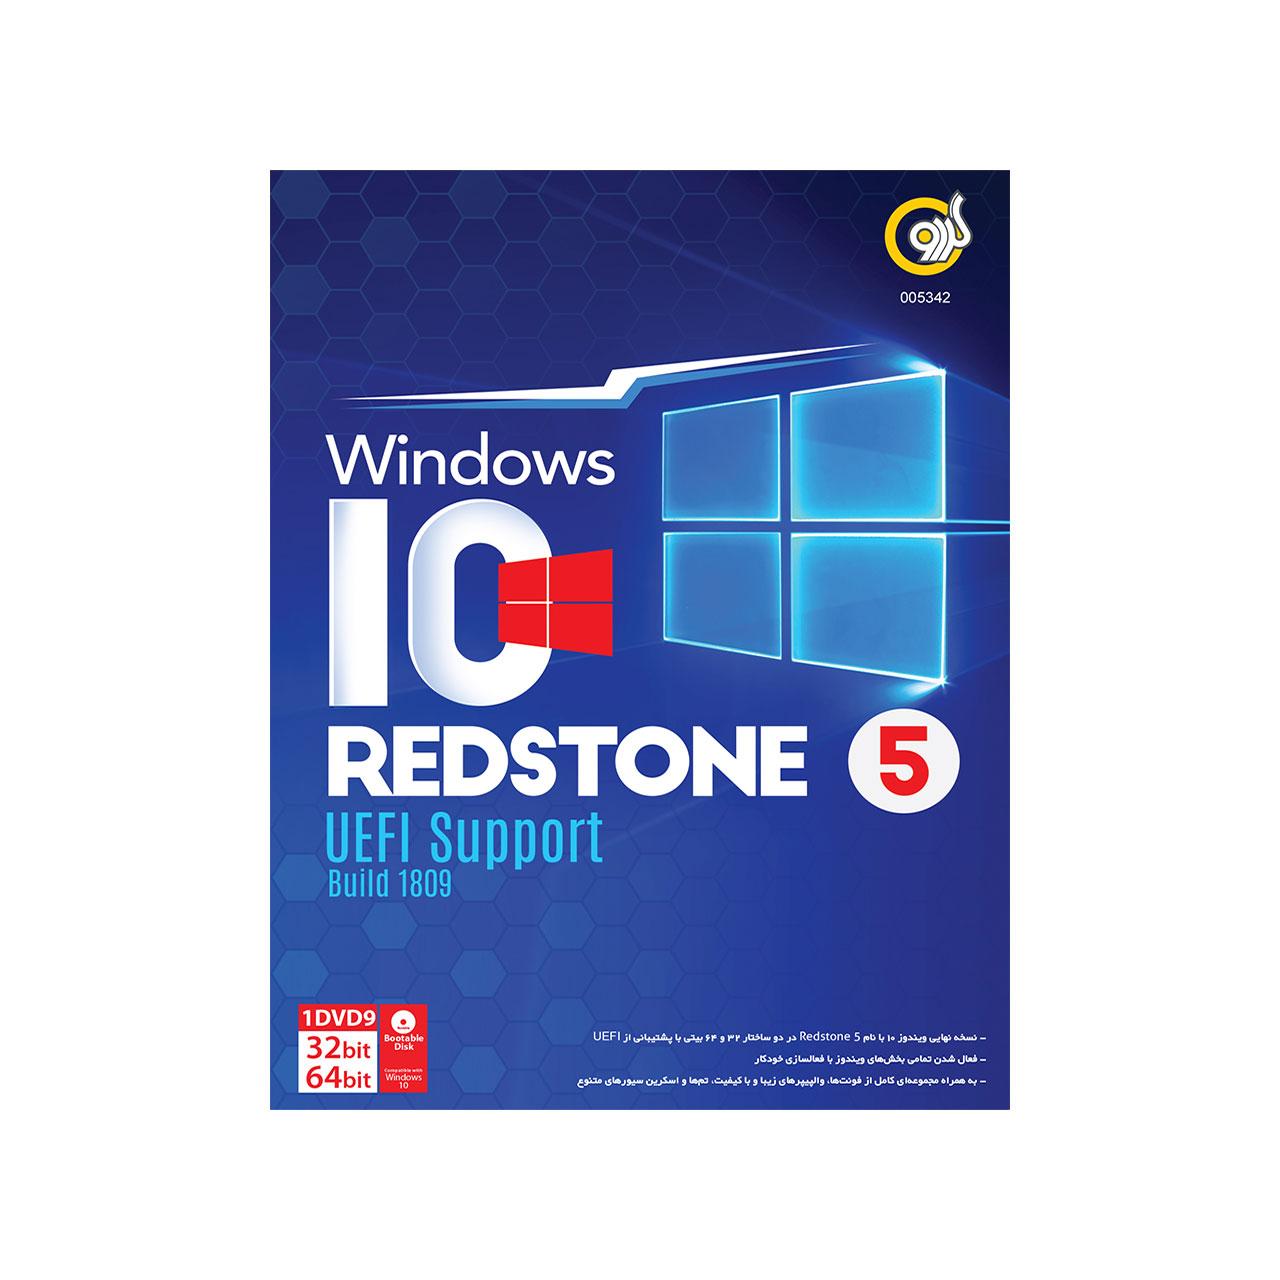 سیستم عامل ویندوز گردو Windows 10 Redstone 5 UEFI Support Build 1809